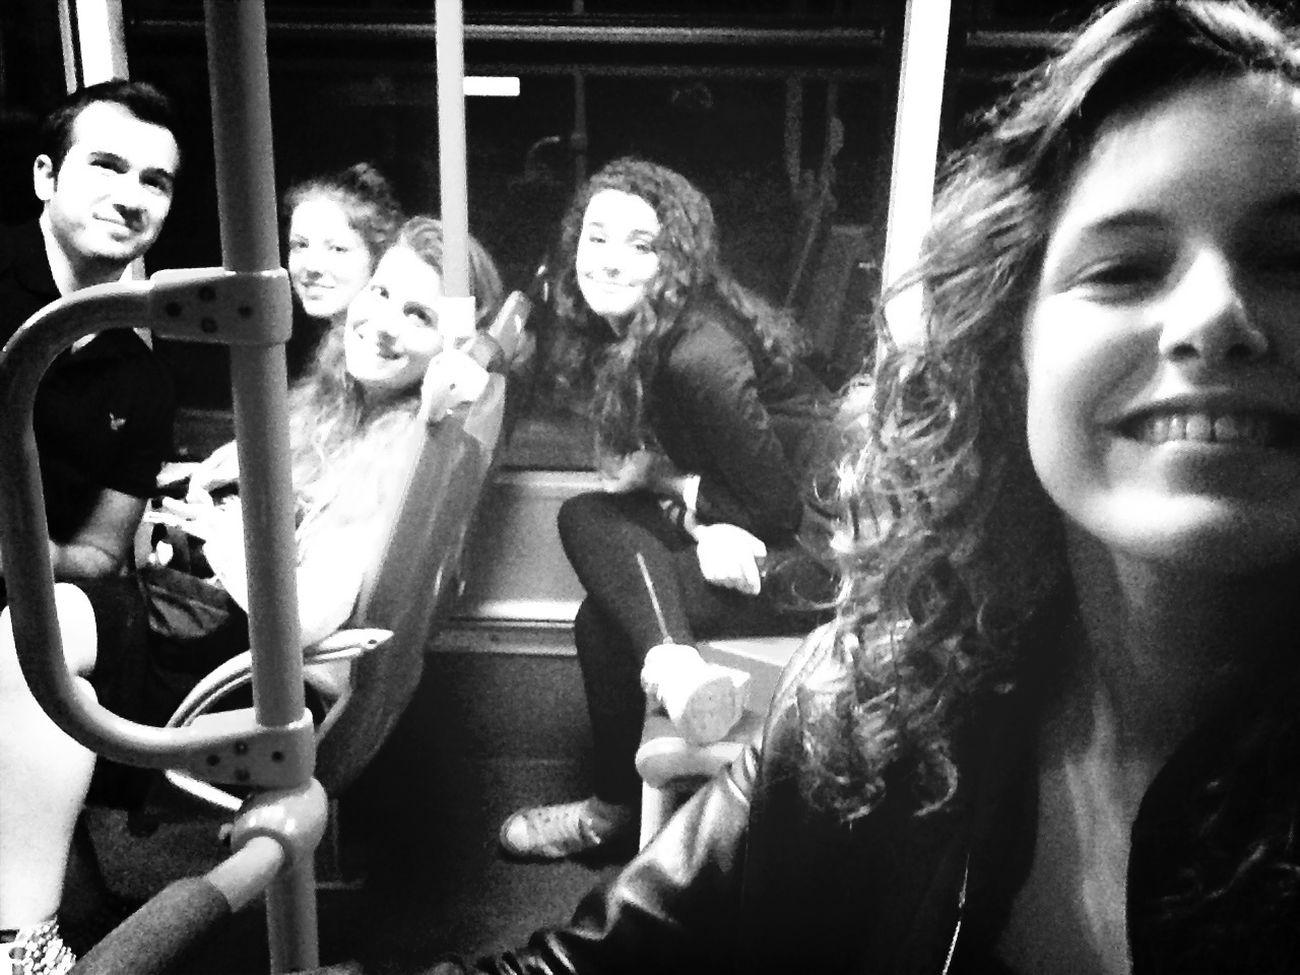 cuccioli in autobus